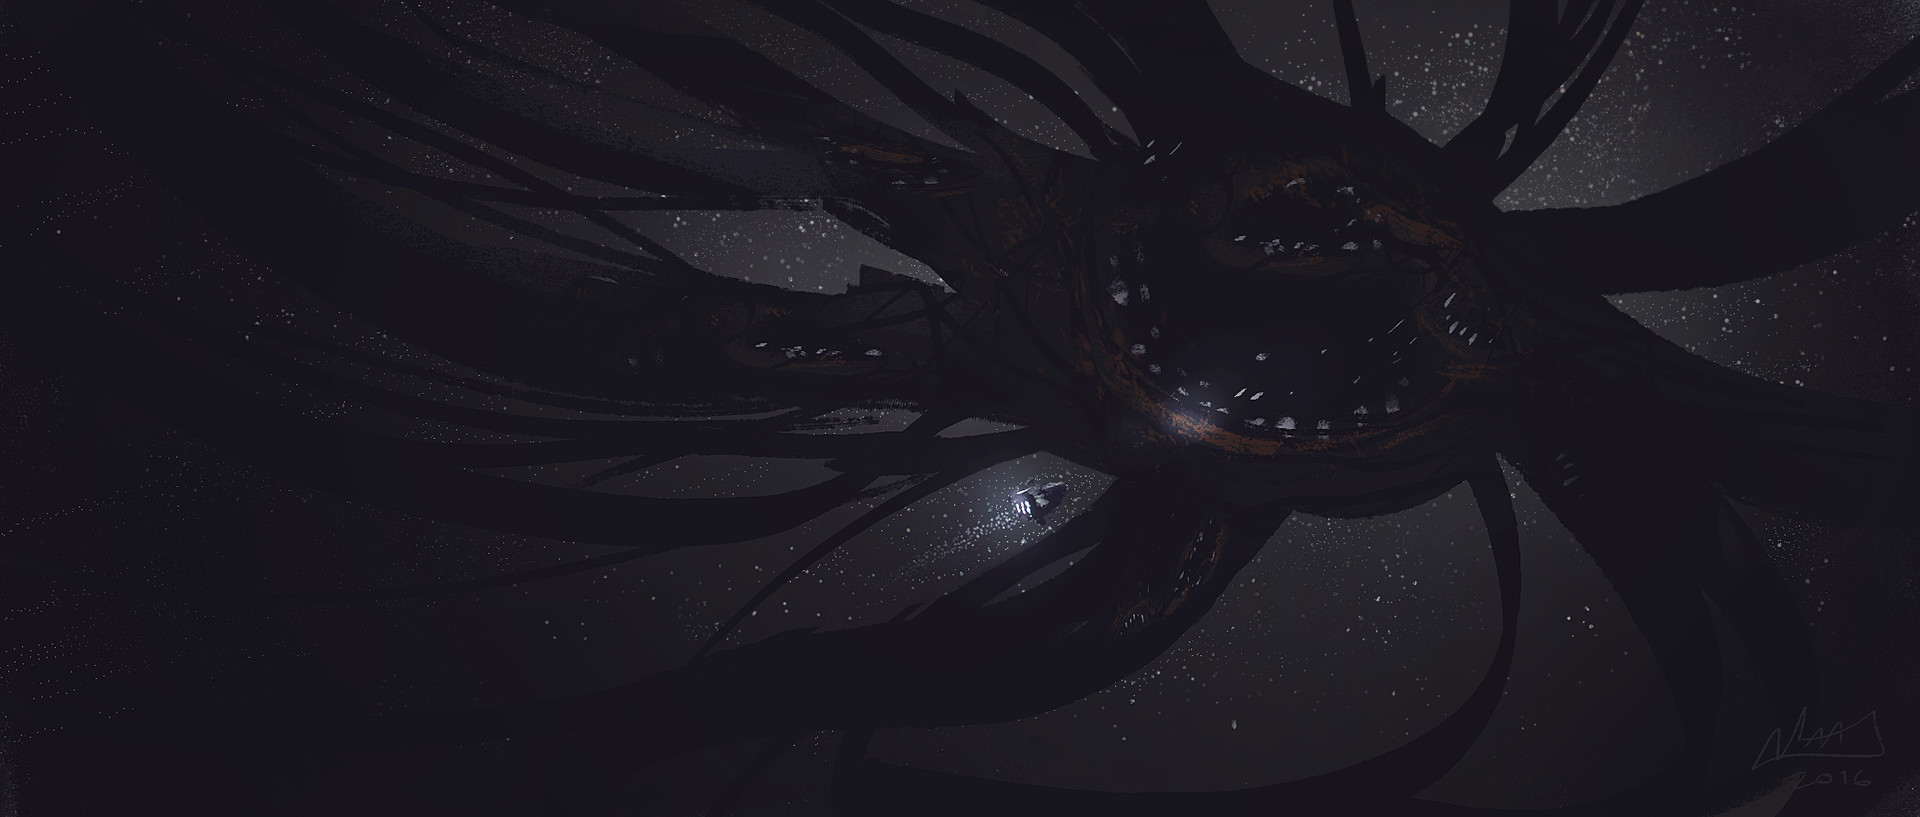 Mike mccain spaceshipvsmonster